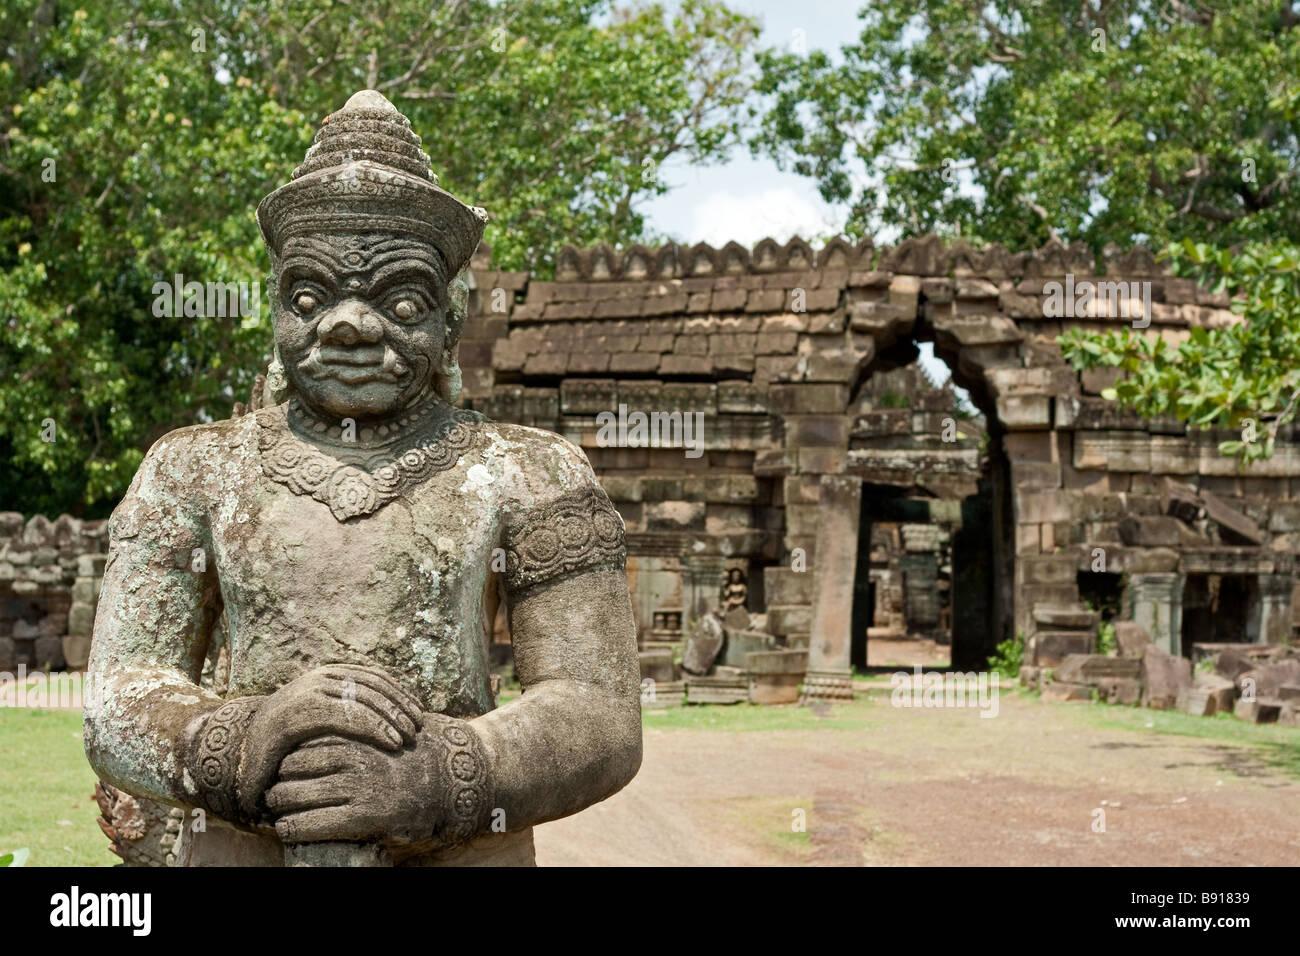 Angkorian stone statue at Wat Nok, Cambodia - Stock Image